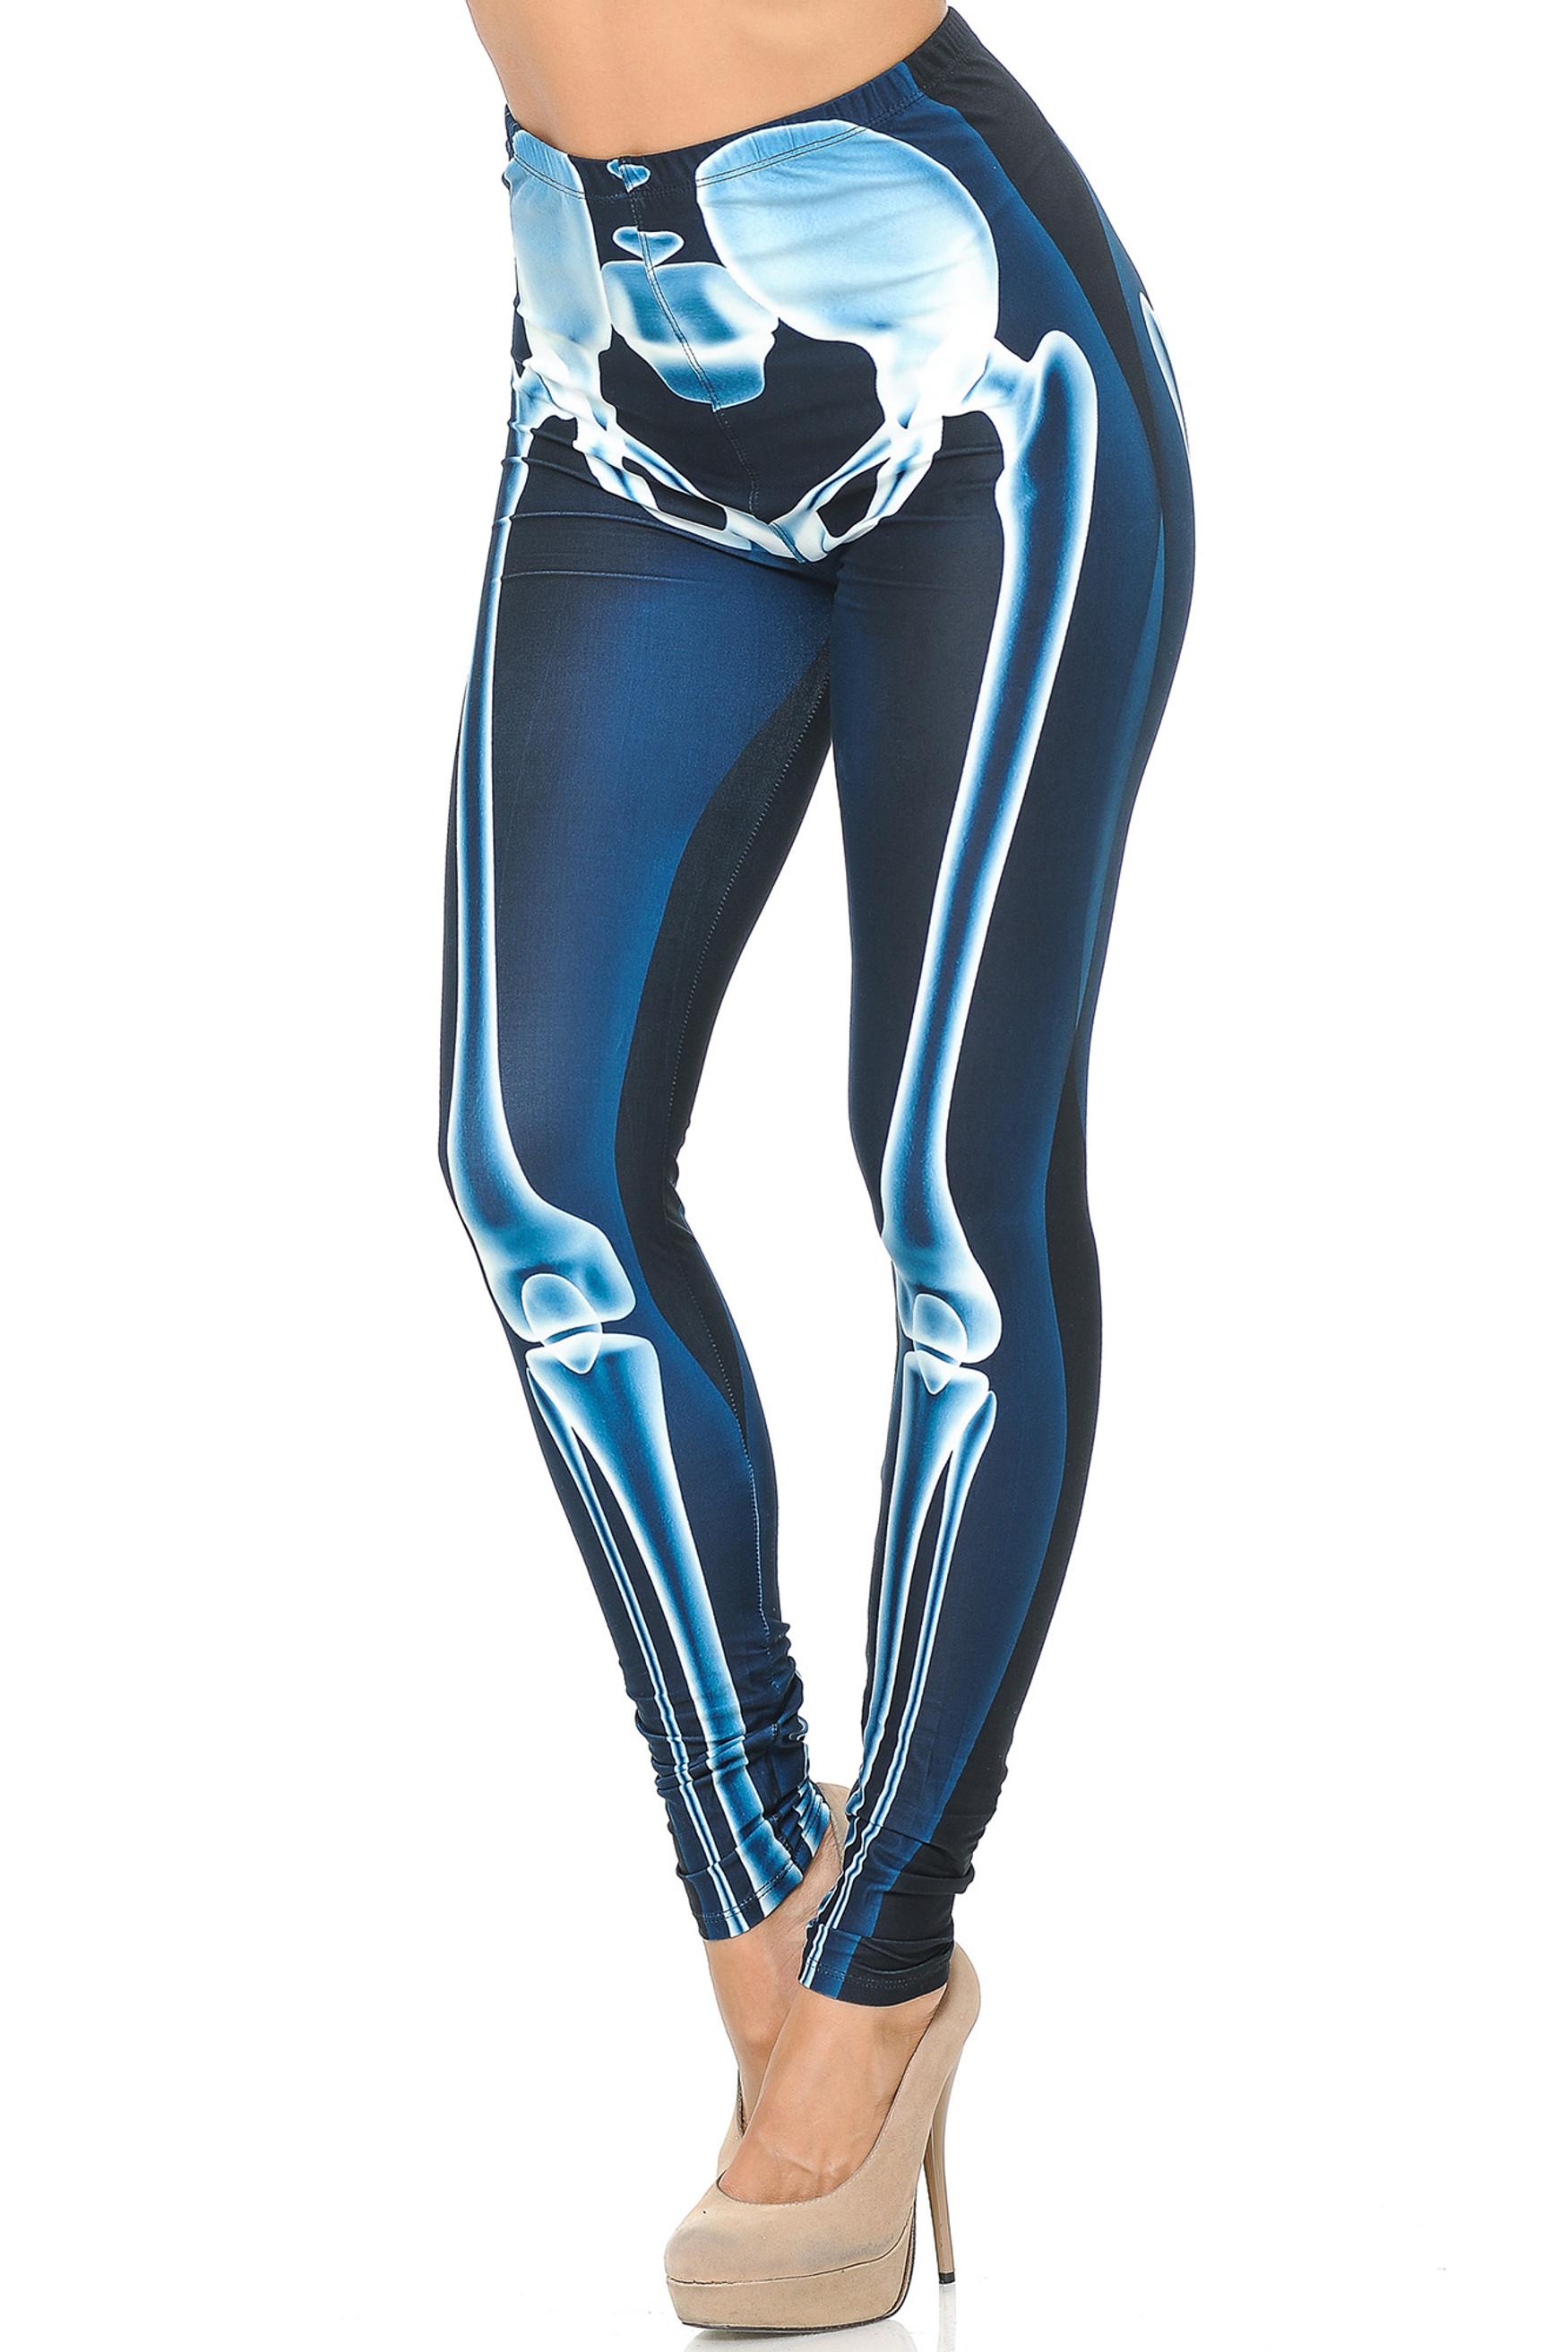 Creamy Soft Radioactive Skeleton Bones Extra Plus Size Leggings - 3X-5X - USA Fashion™